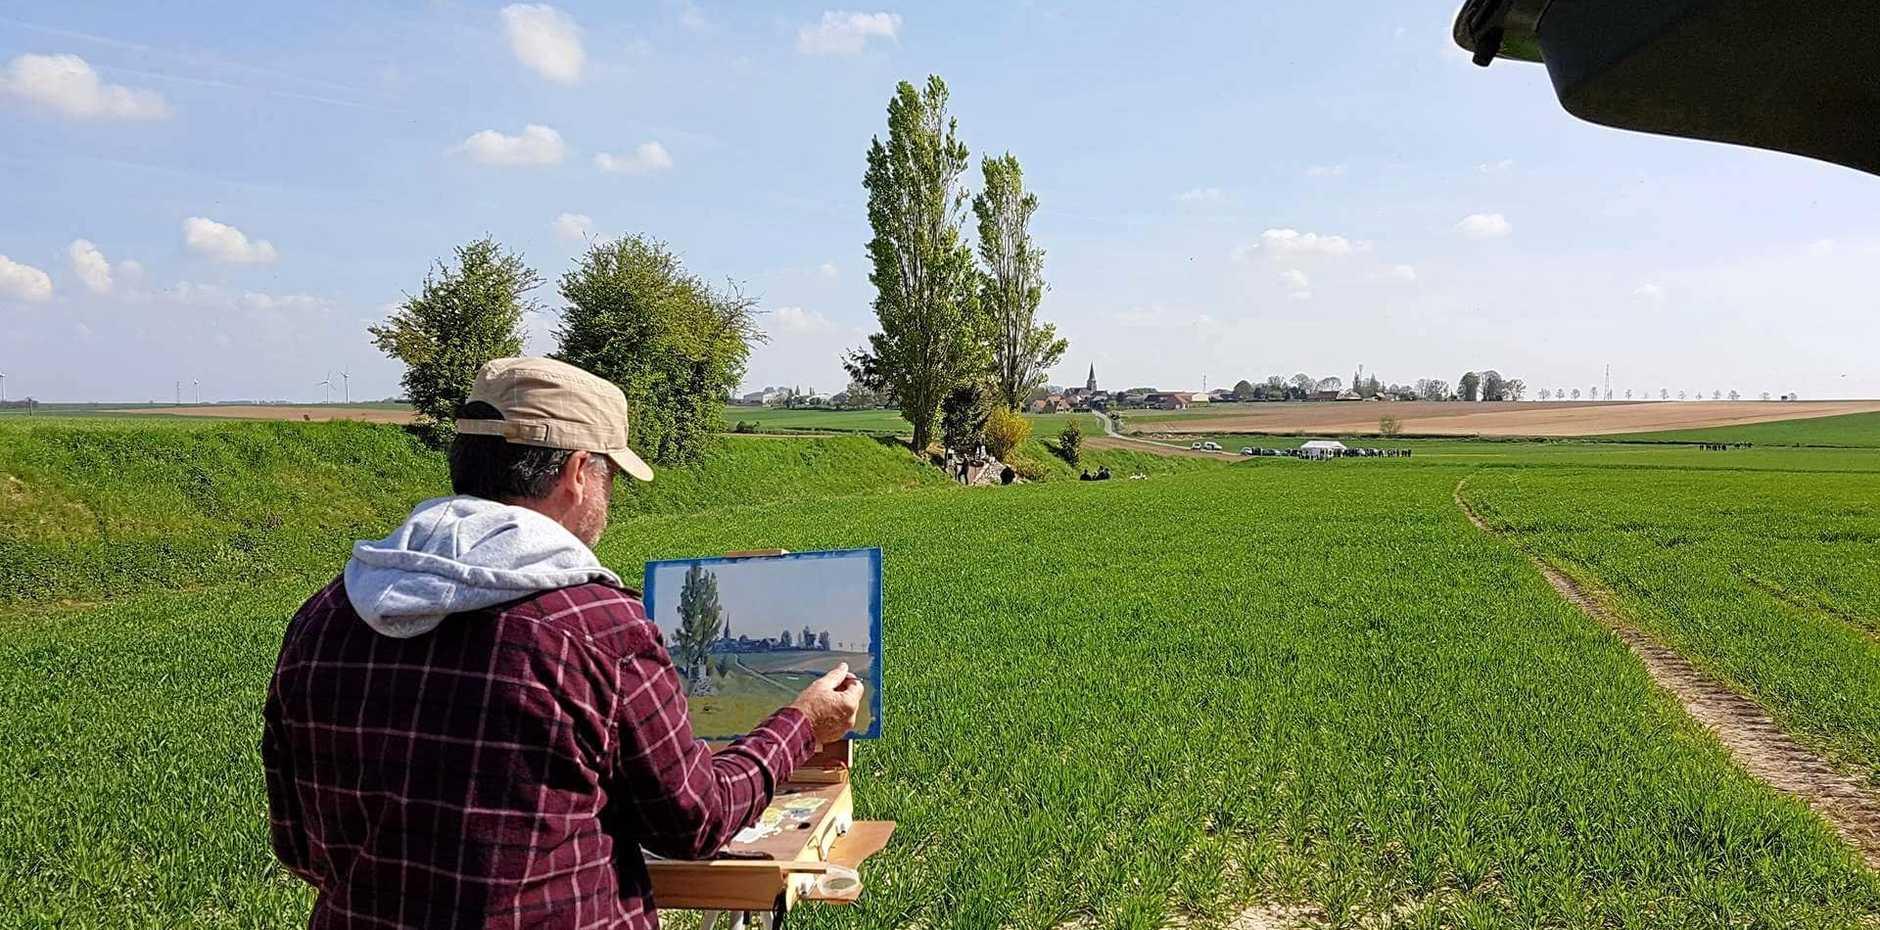 Sunshine Coast artist Garry Dolan paints a scene of the battlefield near the petite cross in Bullecourt.